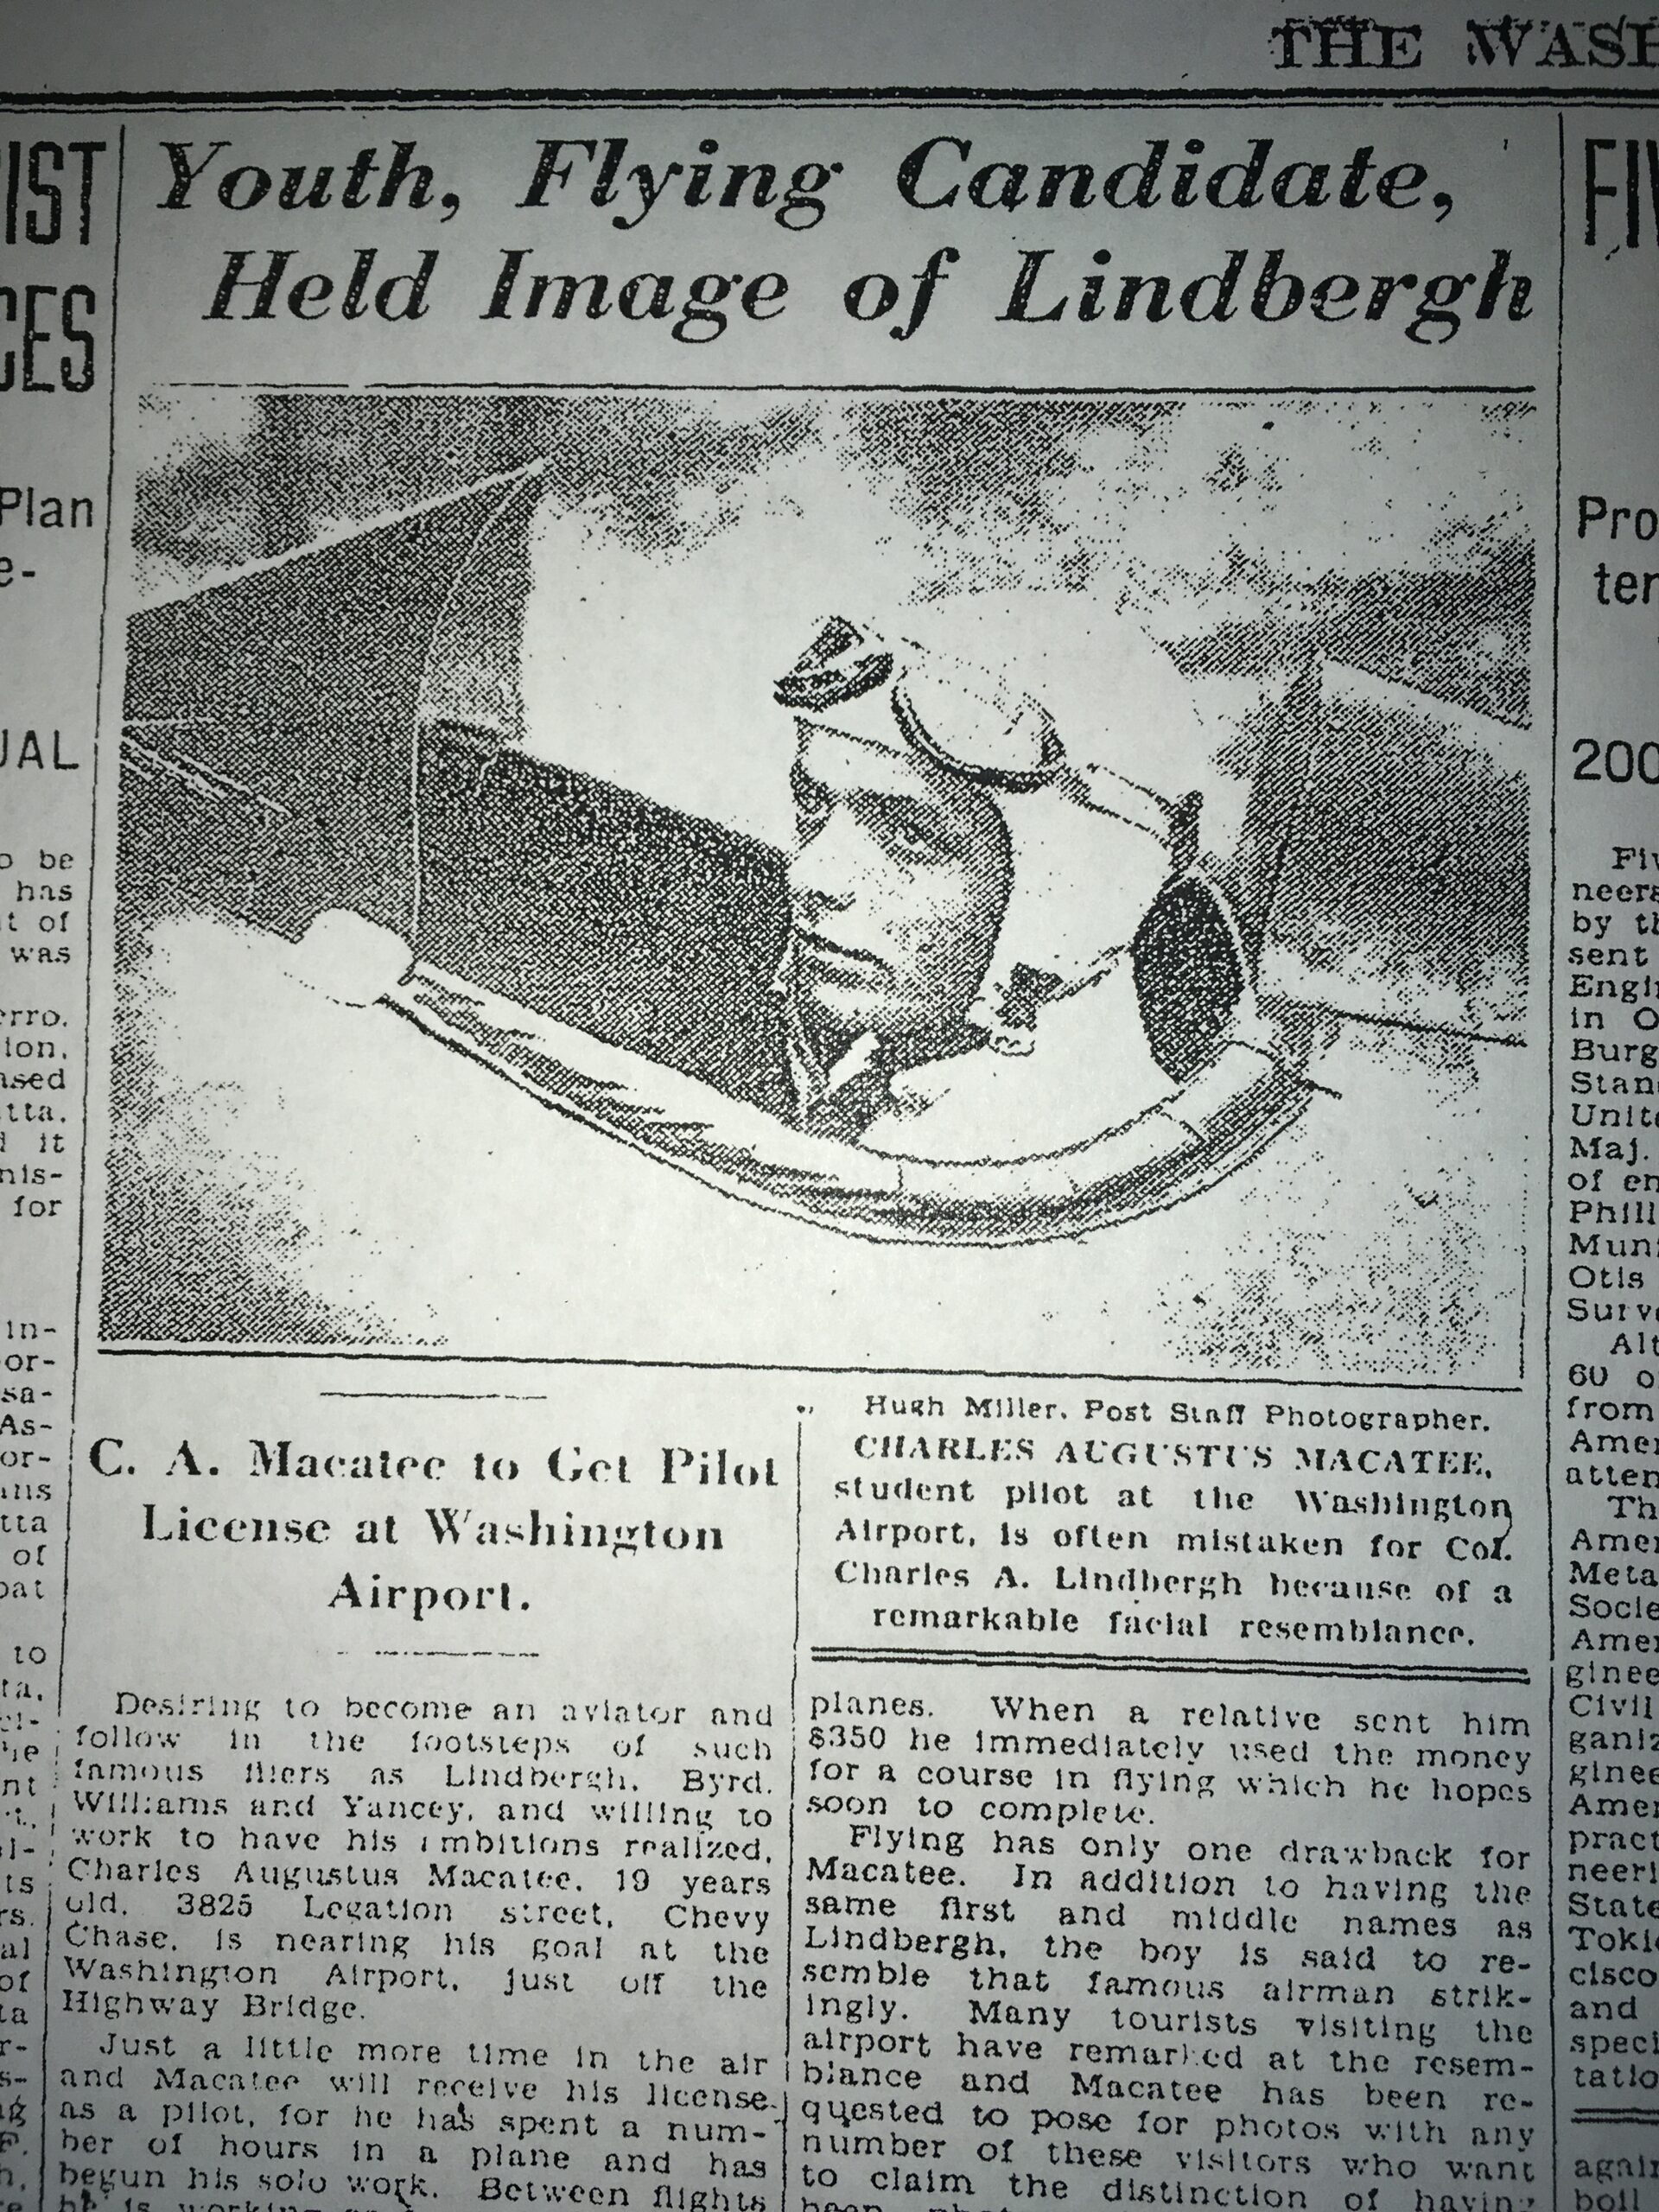 The Washington Post, Aug. 11, 1929, about Charles Macatee's ambition to become a pilot like Charles Lindberg.